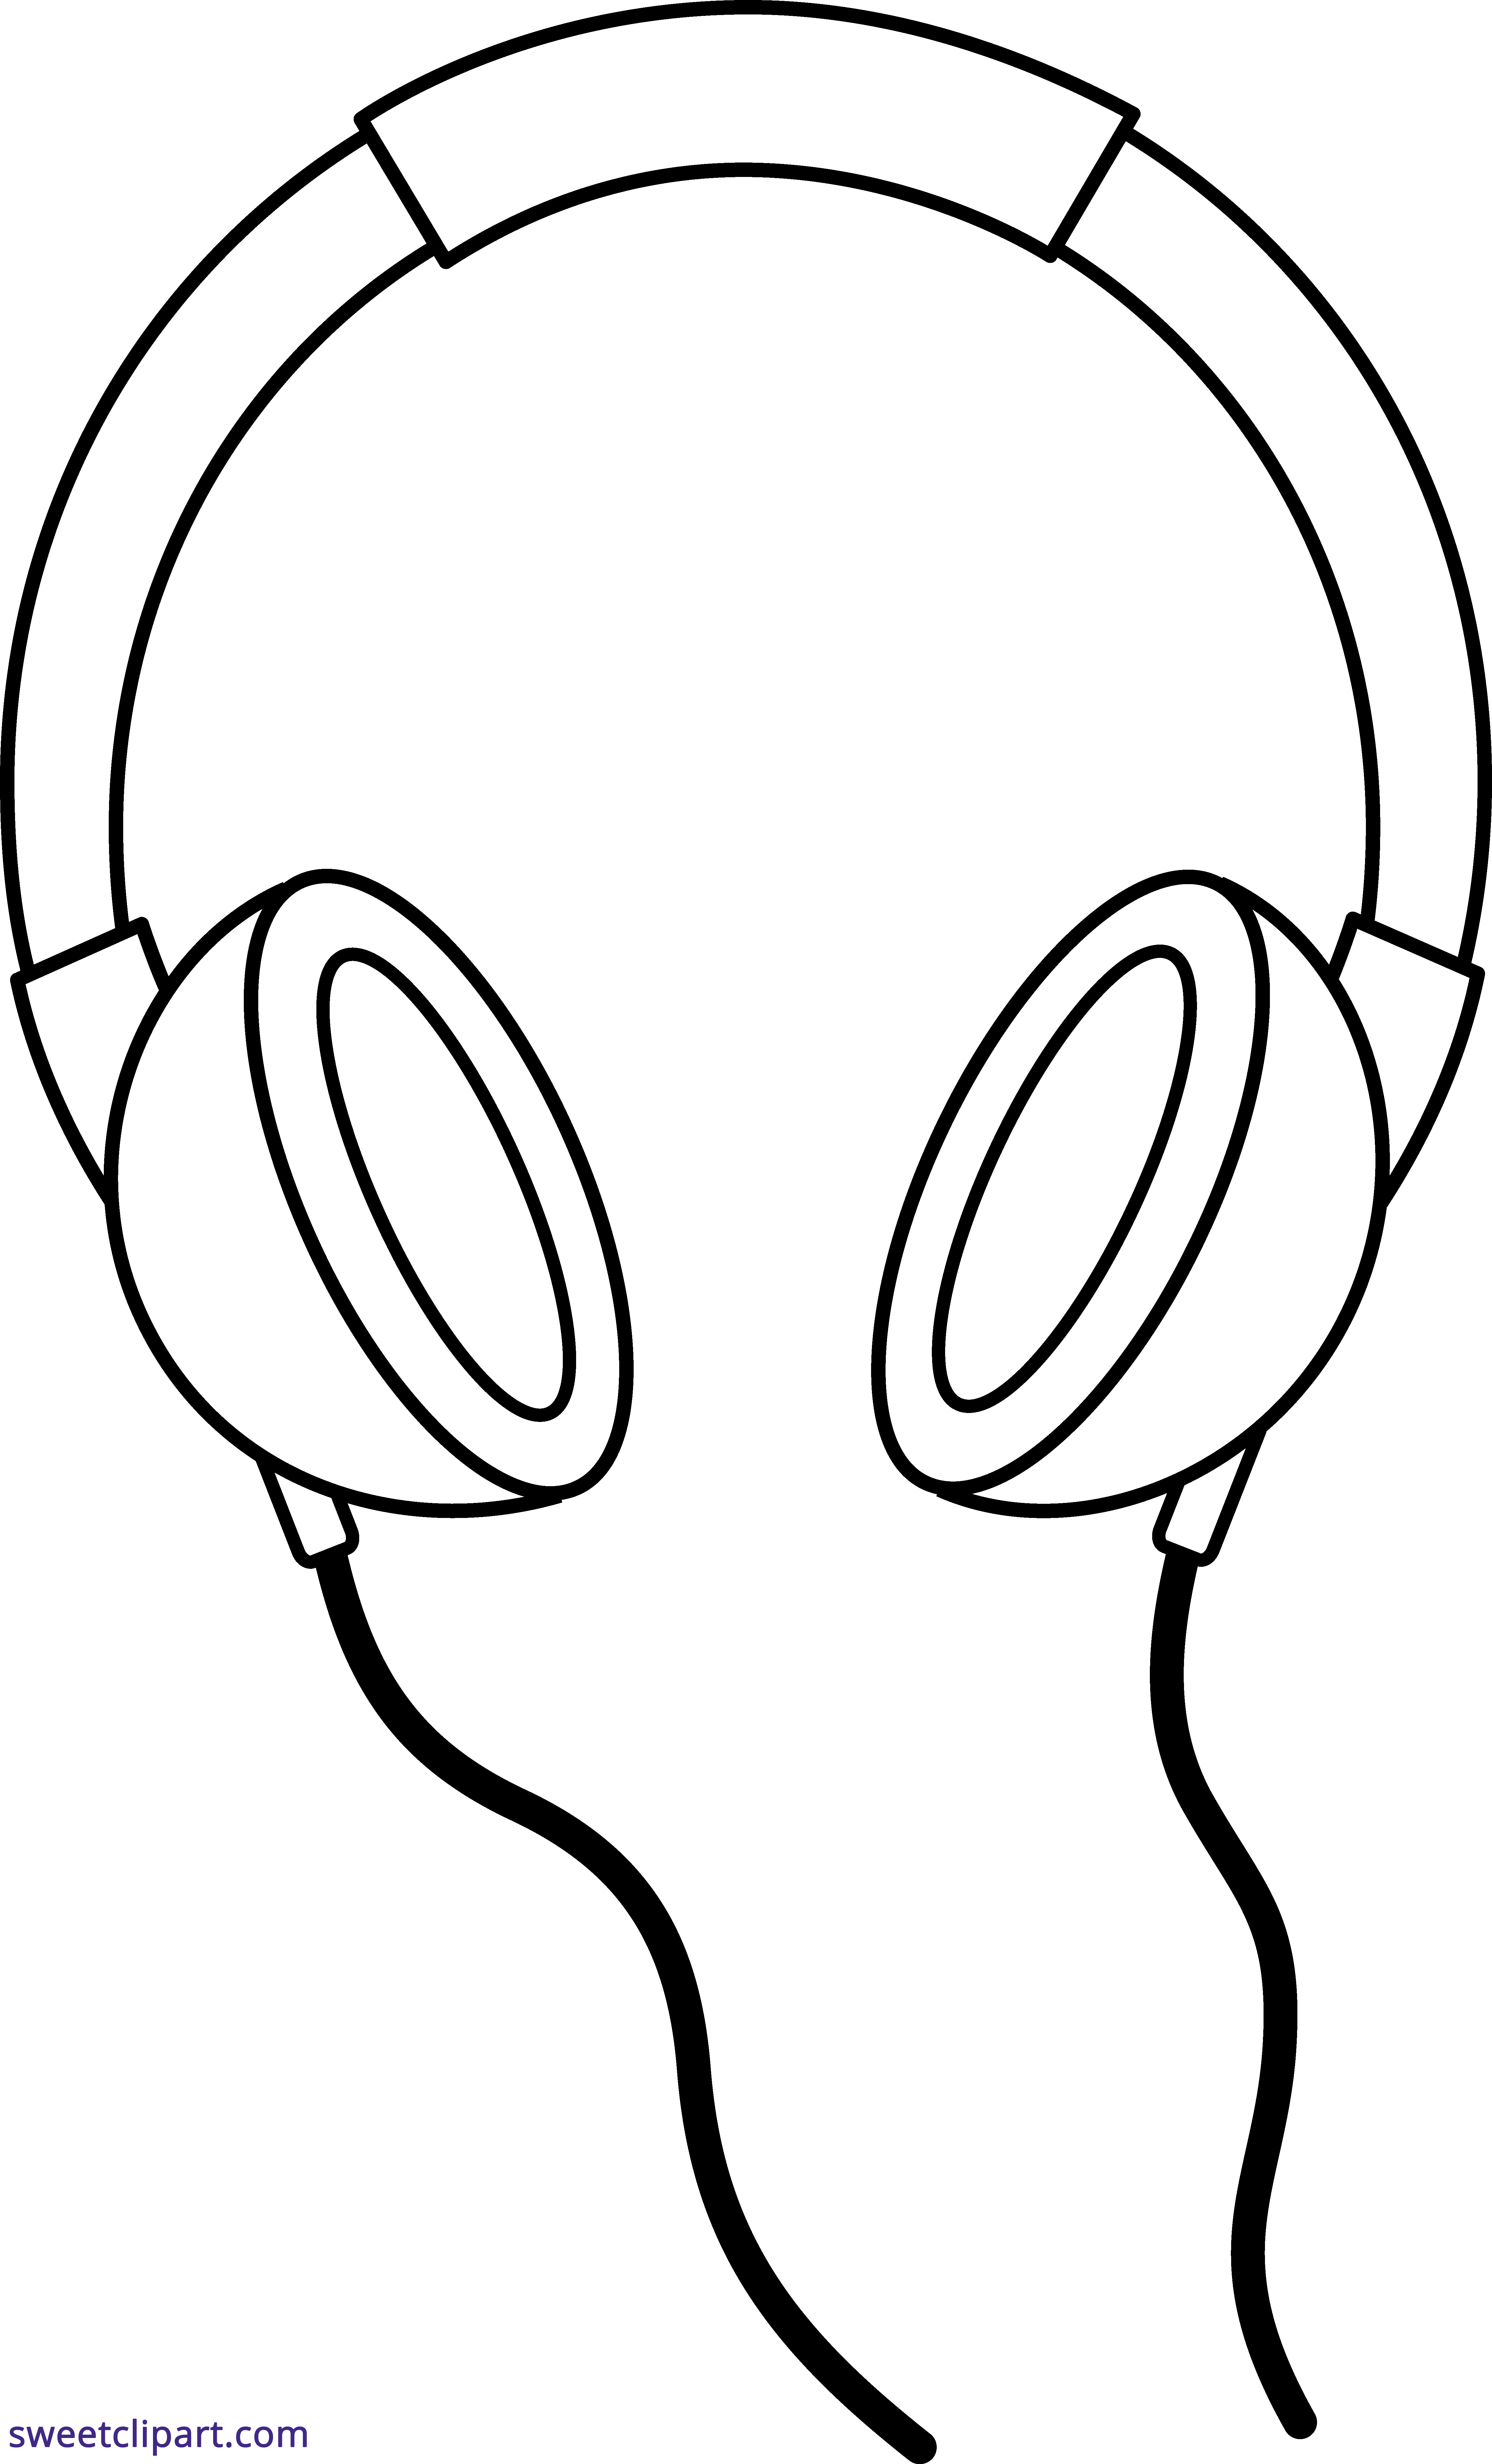 5159x8522 Collection Of Free Headphone Clipart Line Art Amusement Clipart